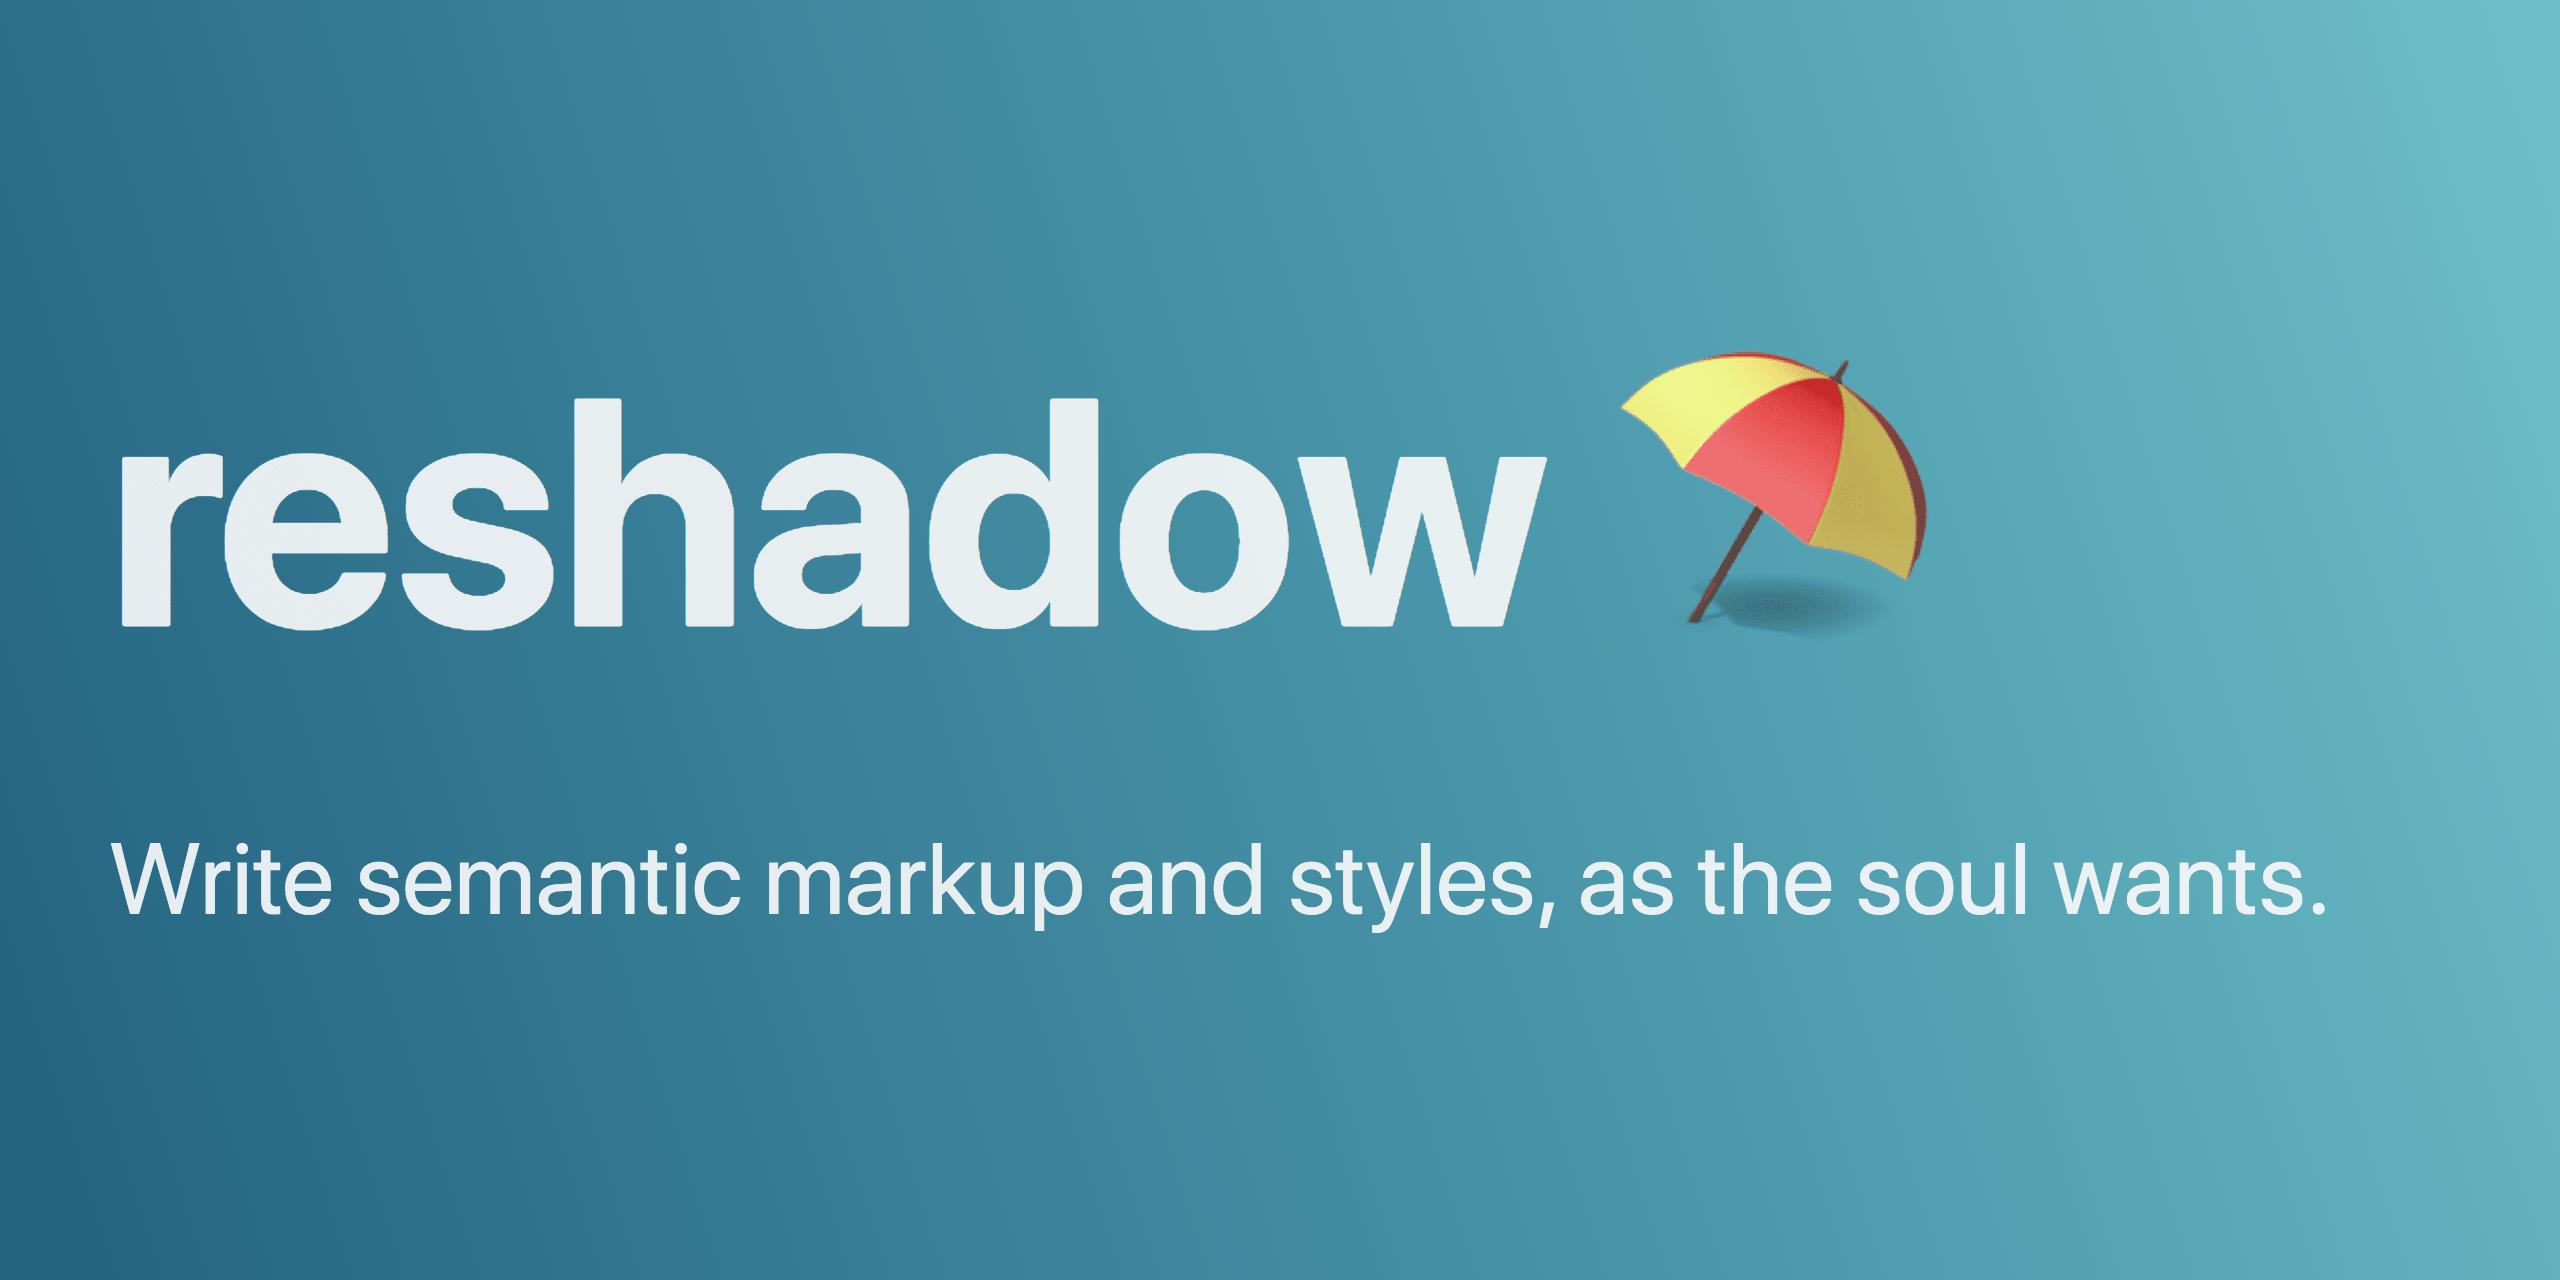 reshadow